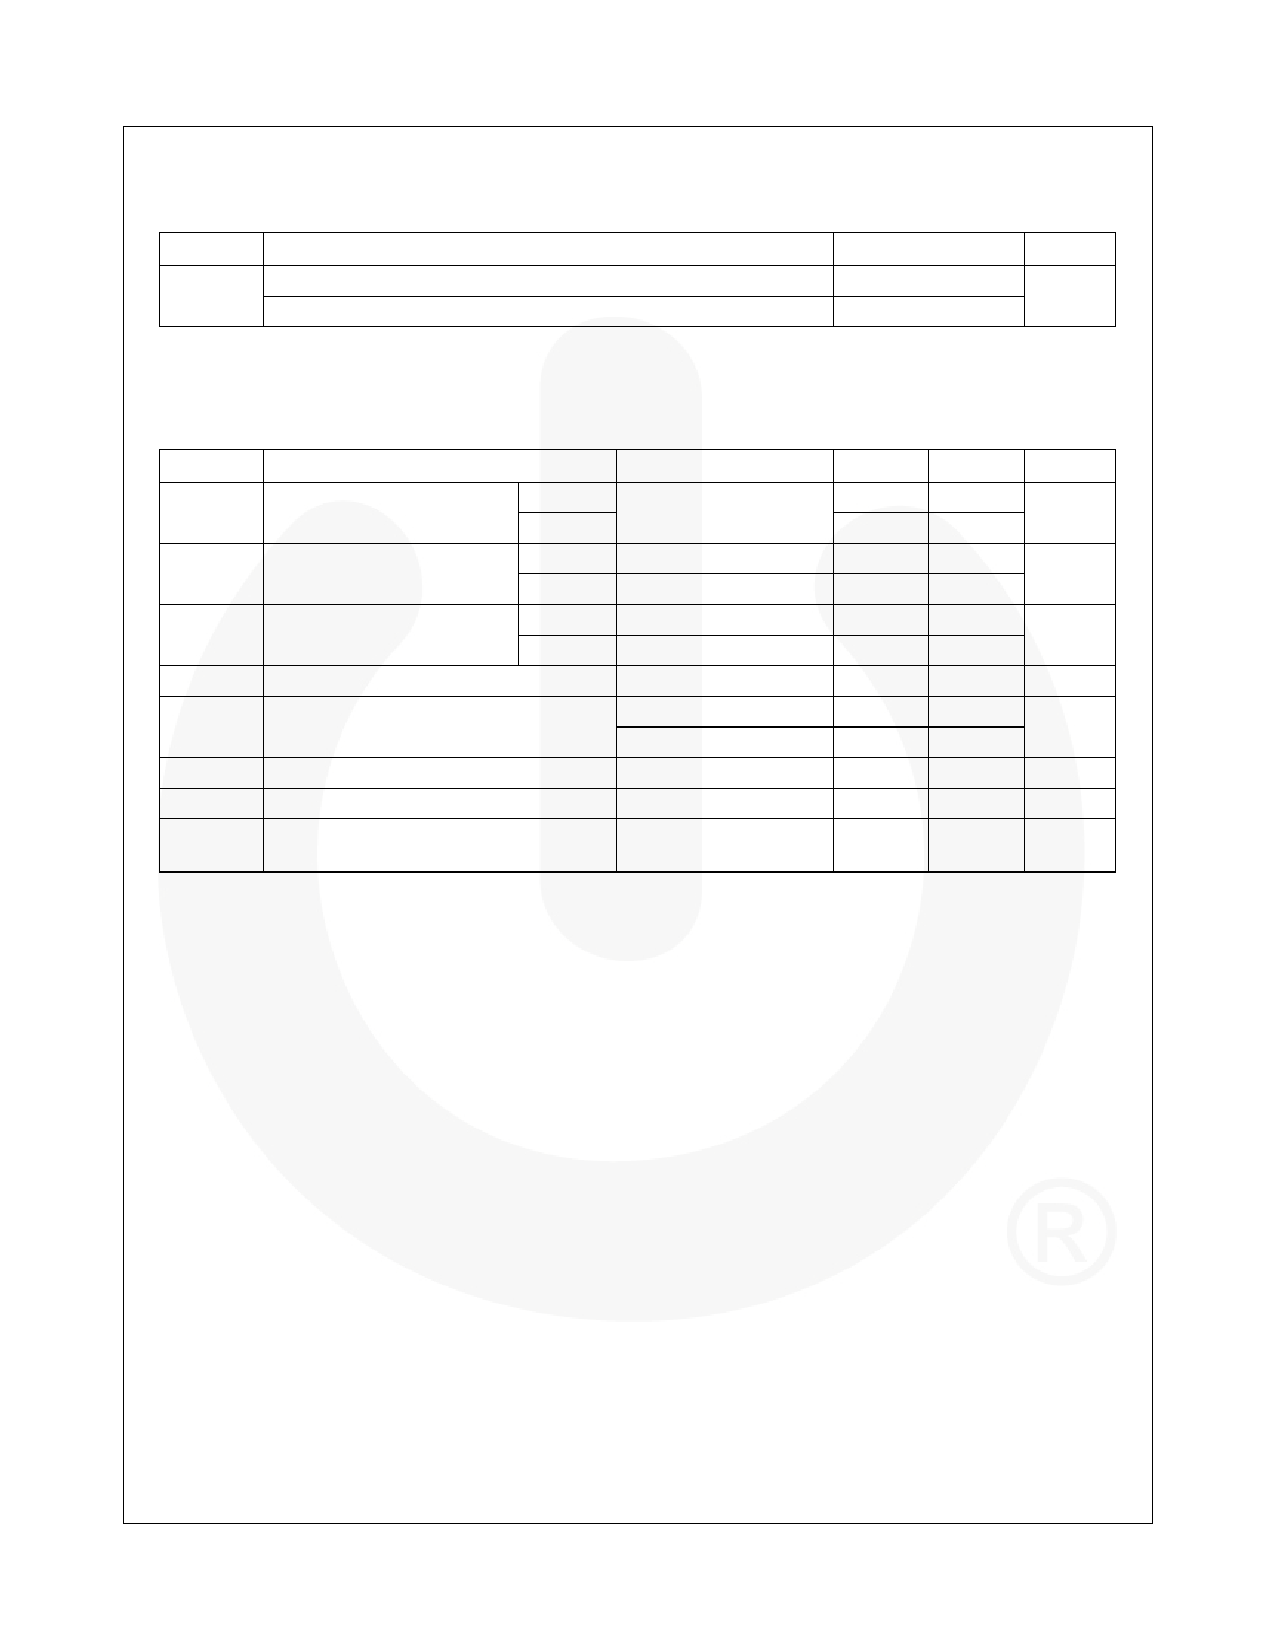 TIP31C pdf, schematic